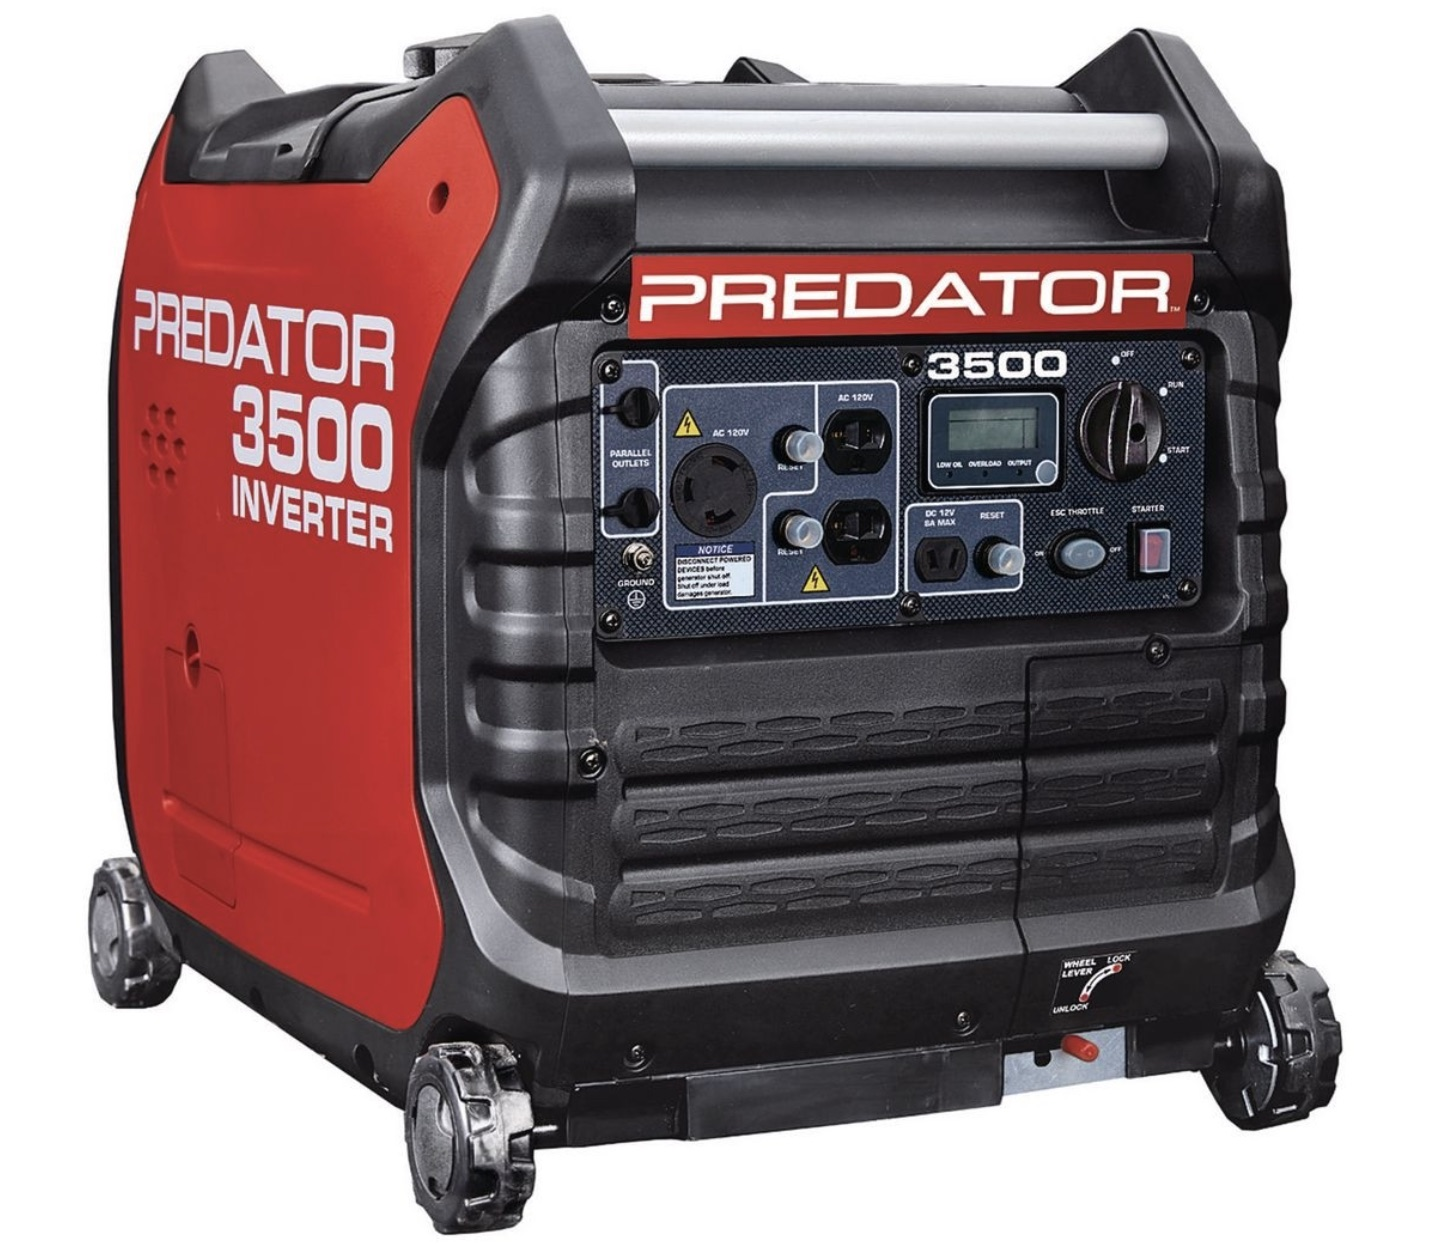 Predator 3500 inverter portable generator